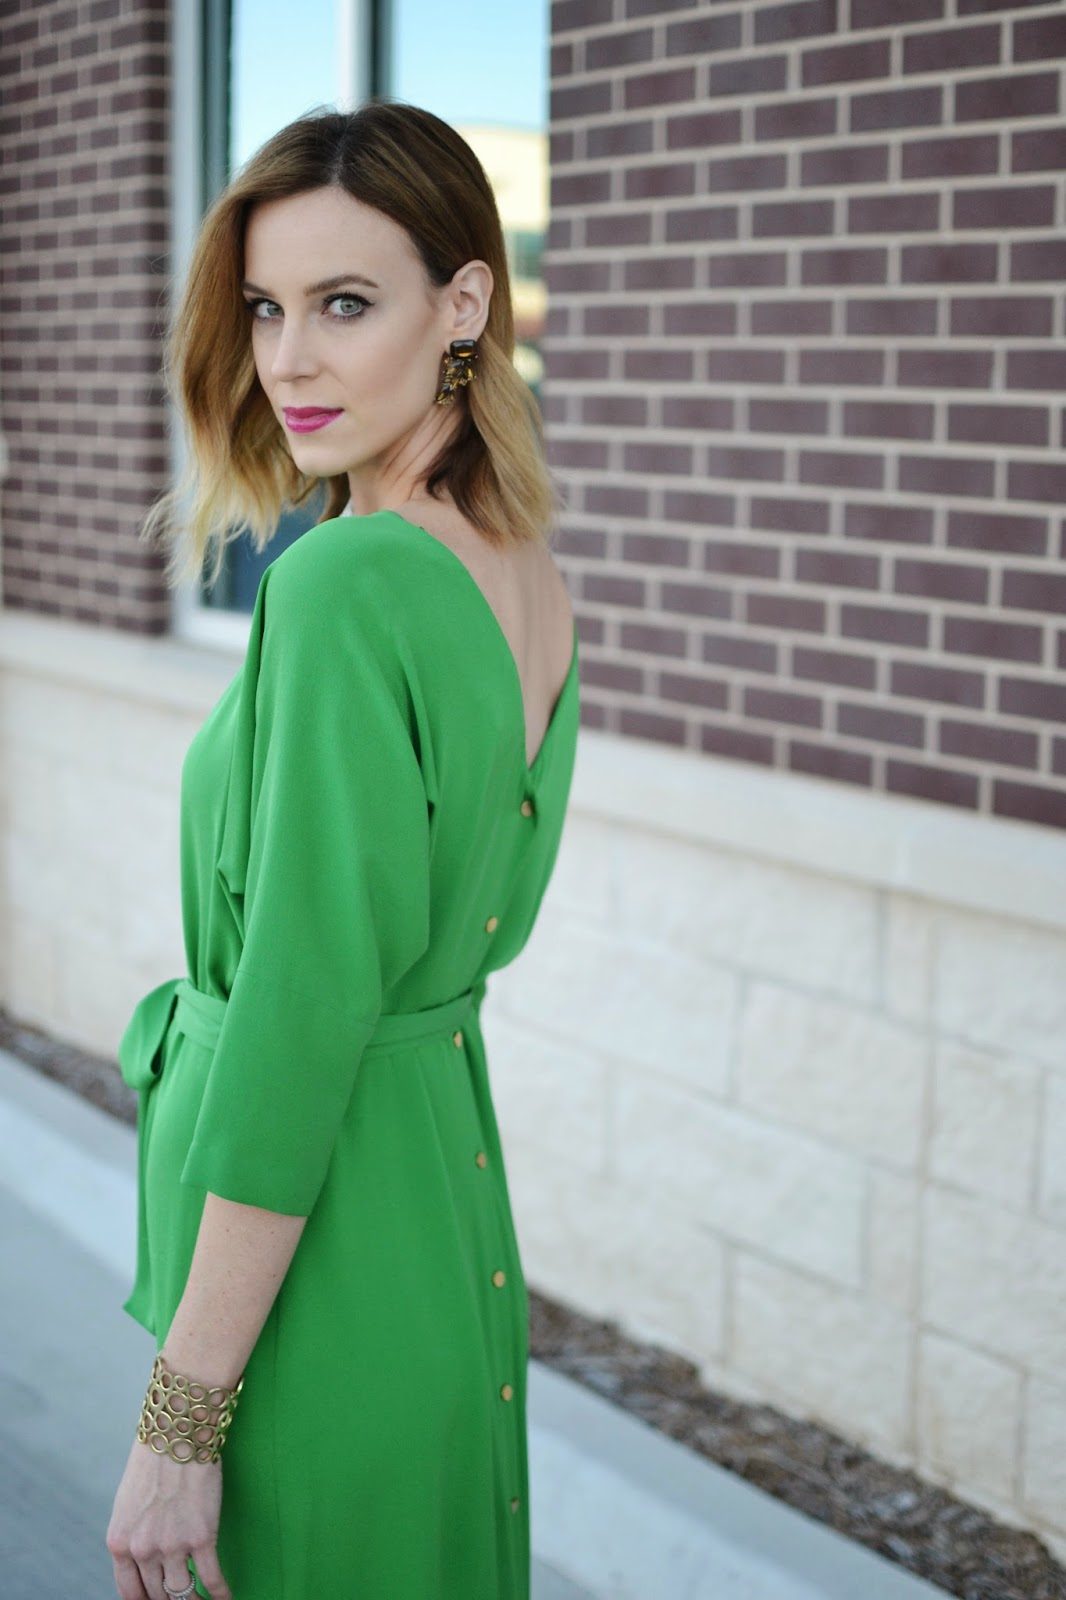 Winter Wedding, Green DVF Dress, Tan Heels, Glamorous